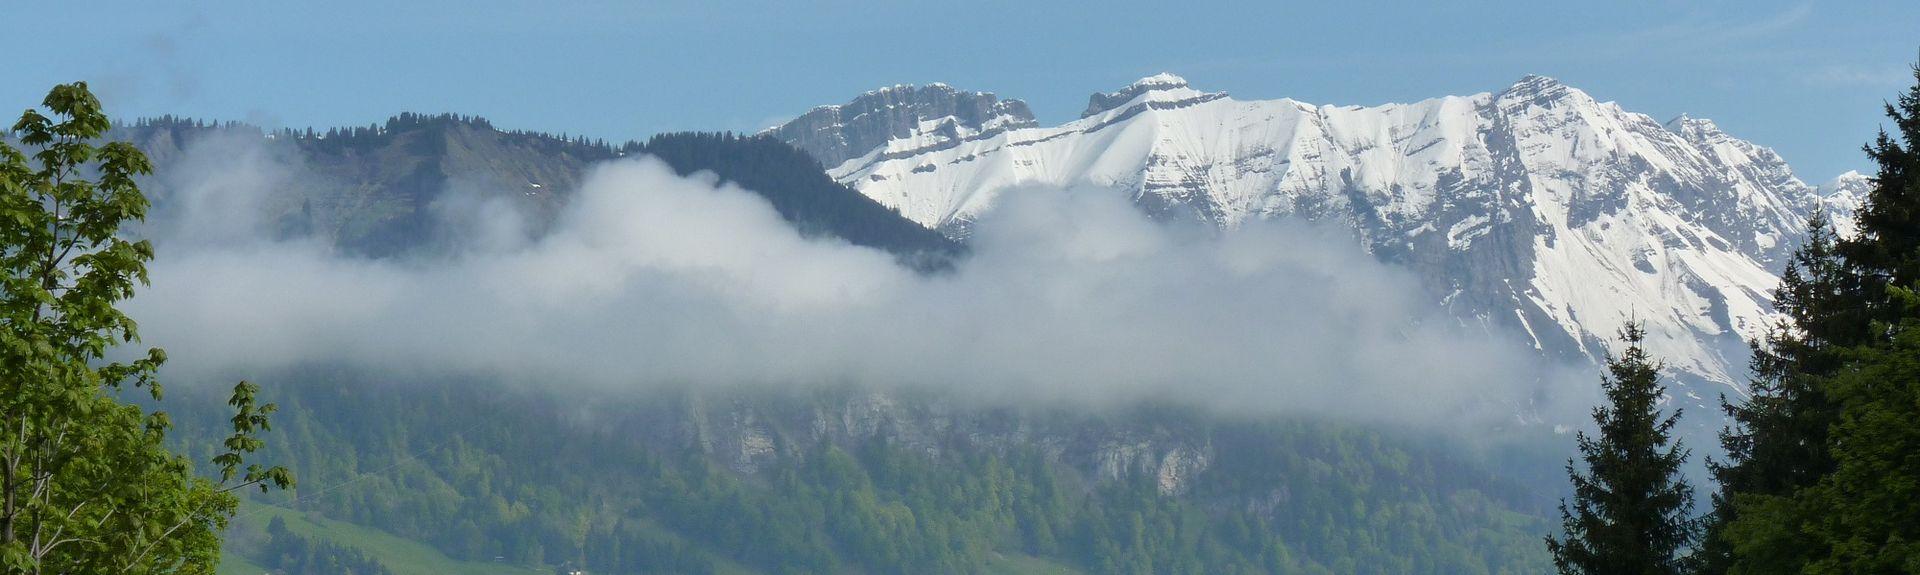 Beaufort, Arlysère, Auvergne-Rhône-Alpes, Frankrijk